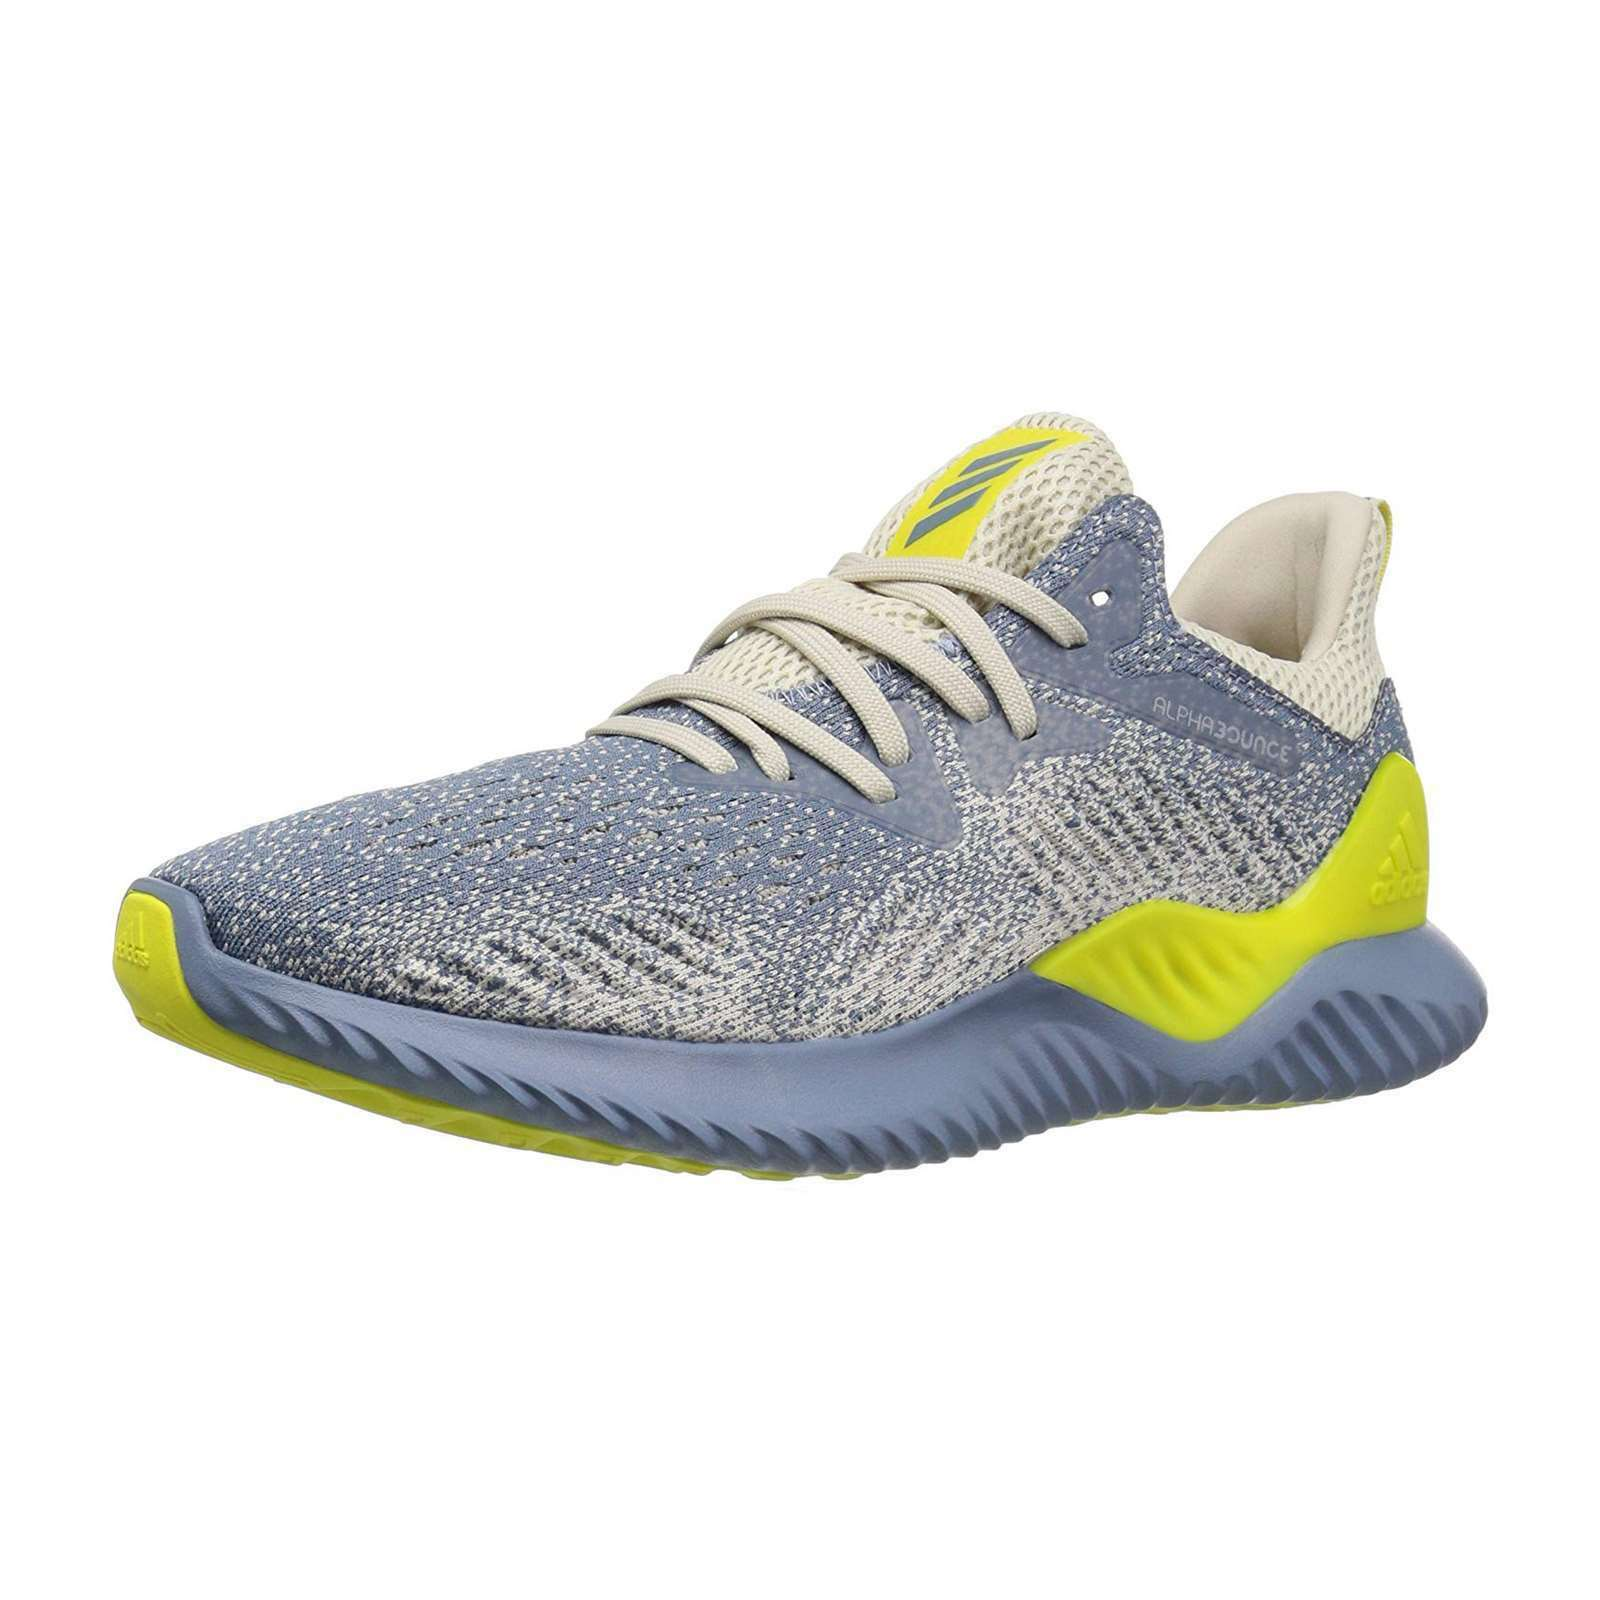 new arrival acfcc 32a00 ... Nuevas Tenis De Entrenamiento Para Hombre Hombre Hombre Adidas Adidas  alphabounce Beyond Zapatillas a0efcd ...